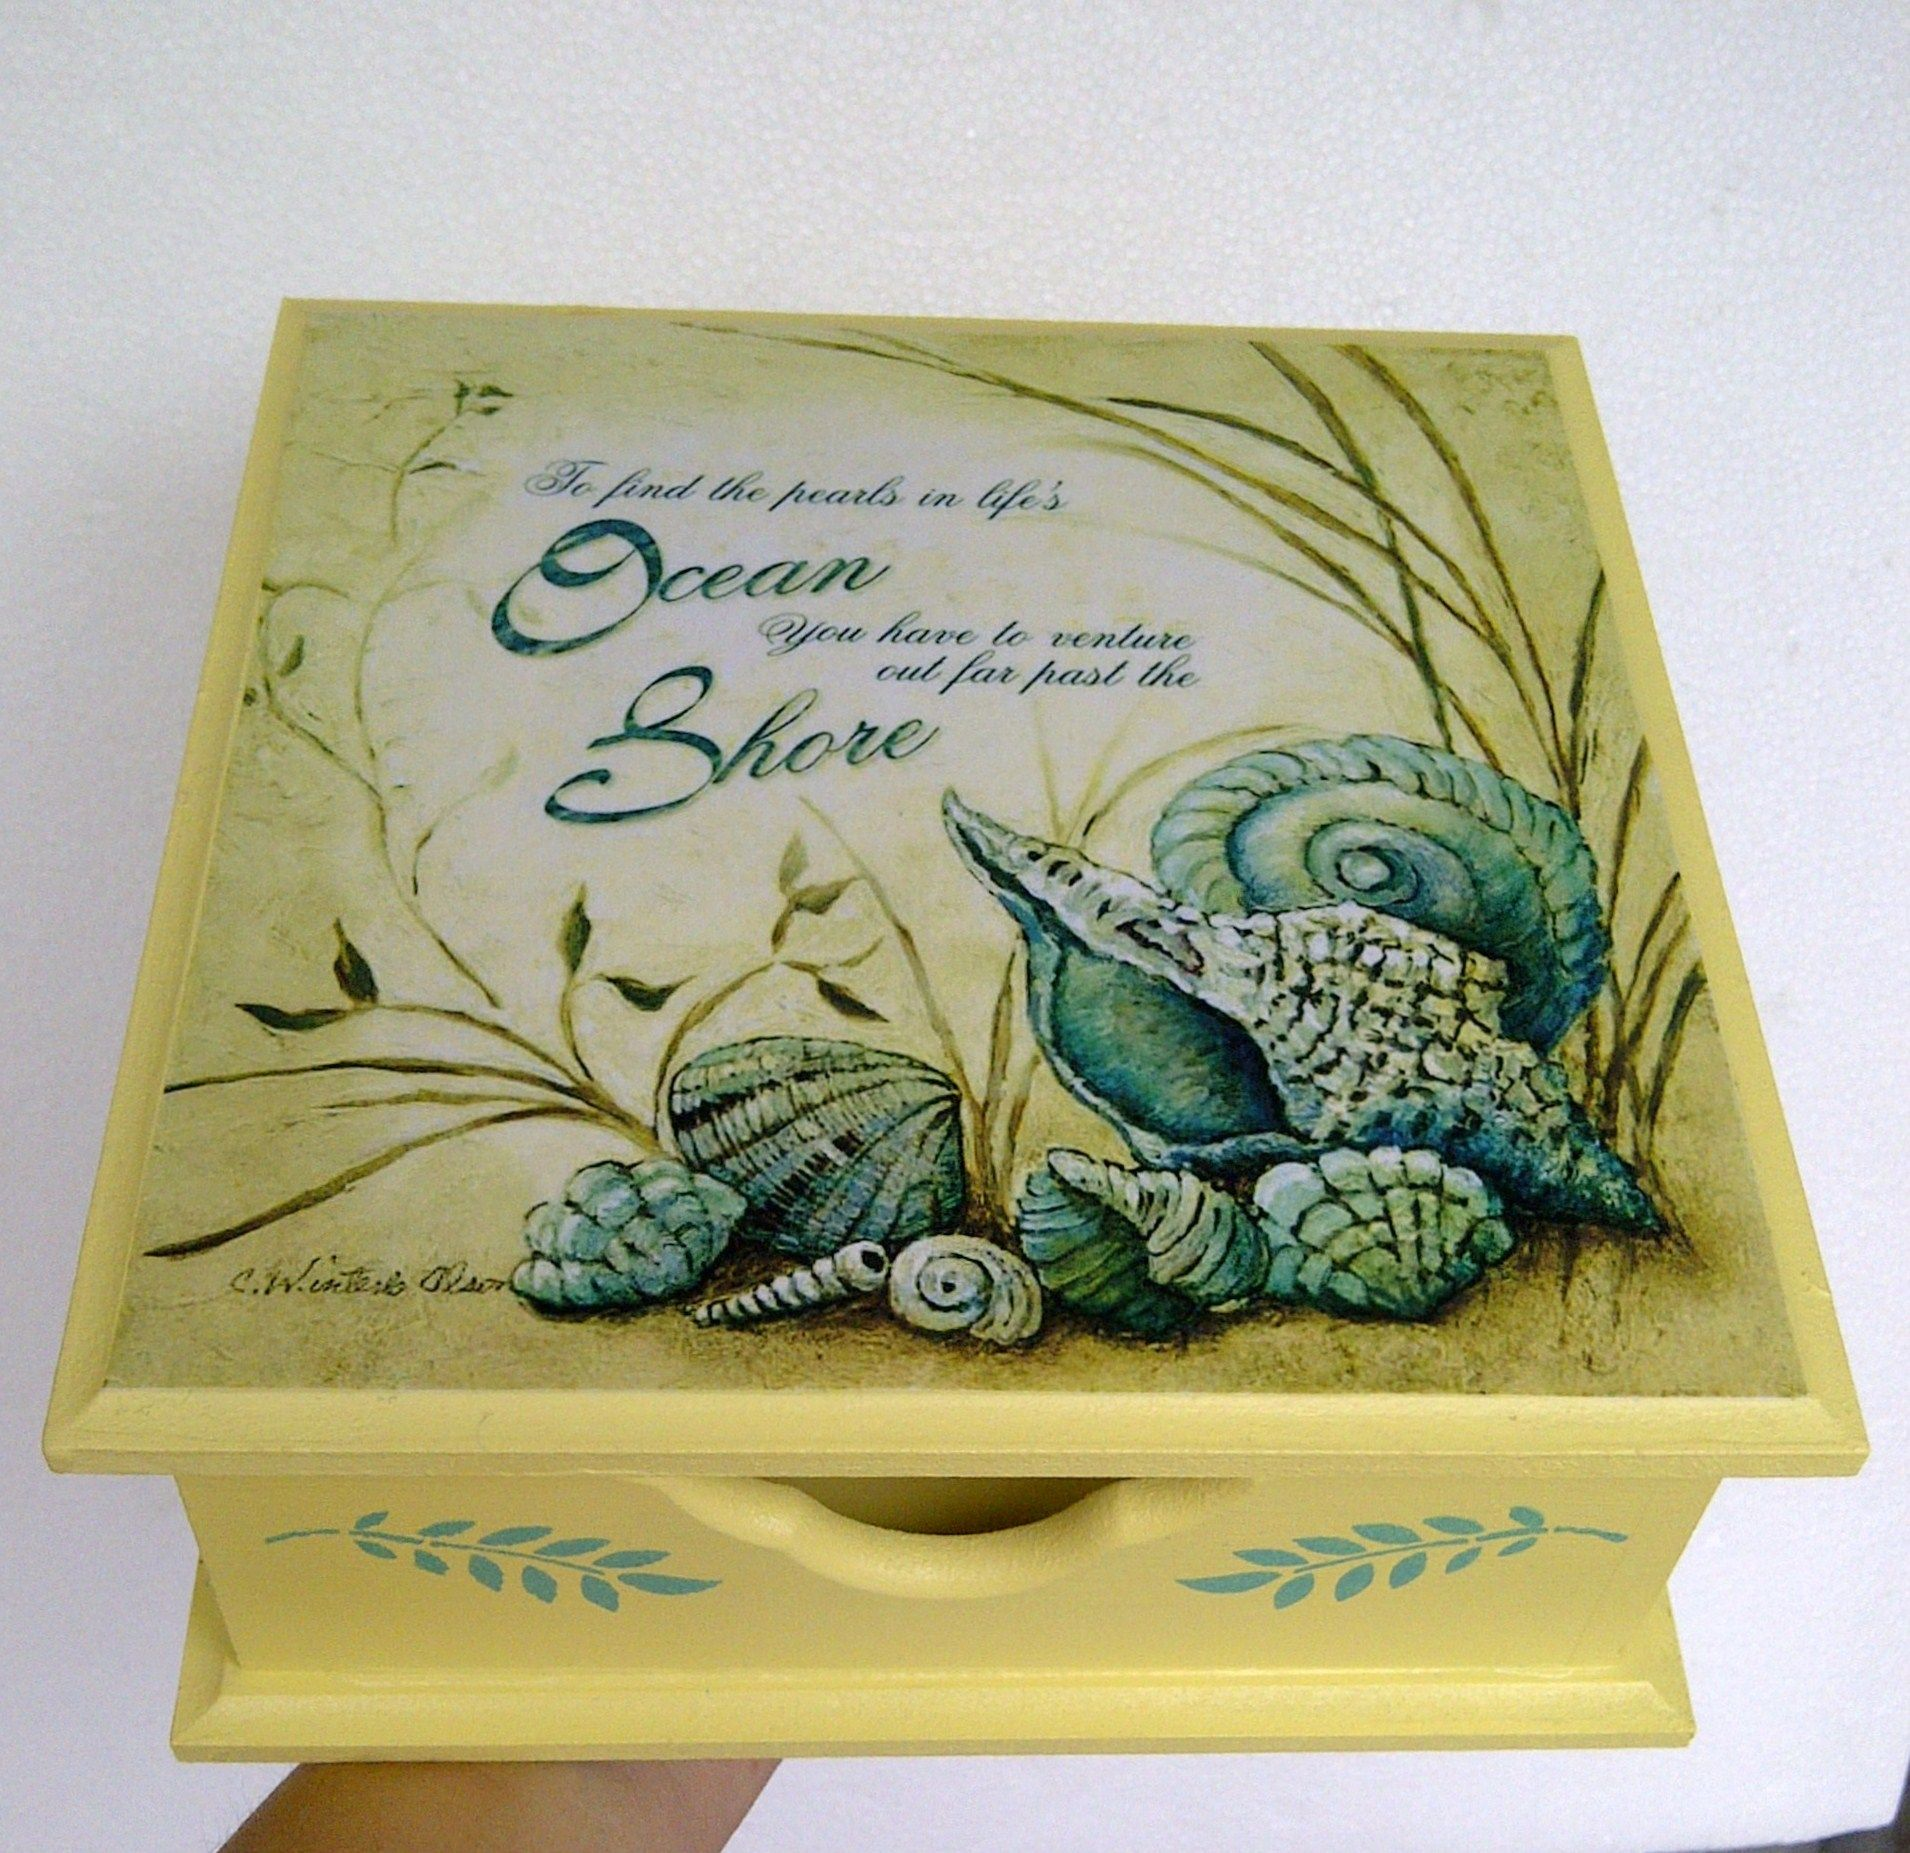 Decoupage decoupage pinterest cajas pinturas for Cosas decorativas para el hogar